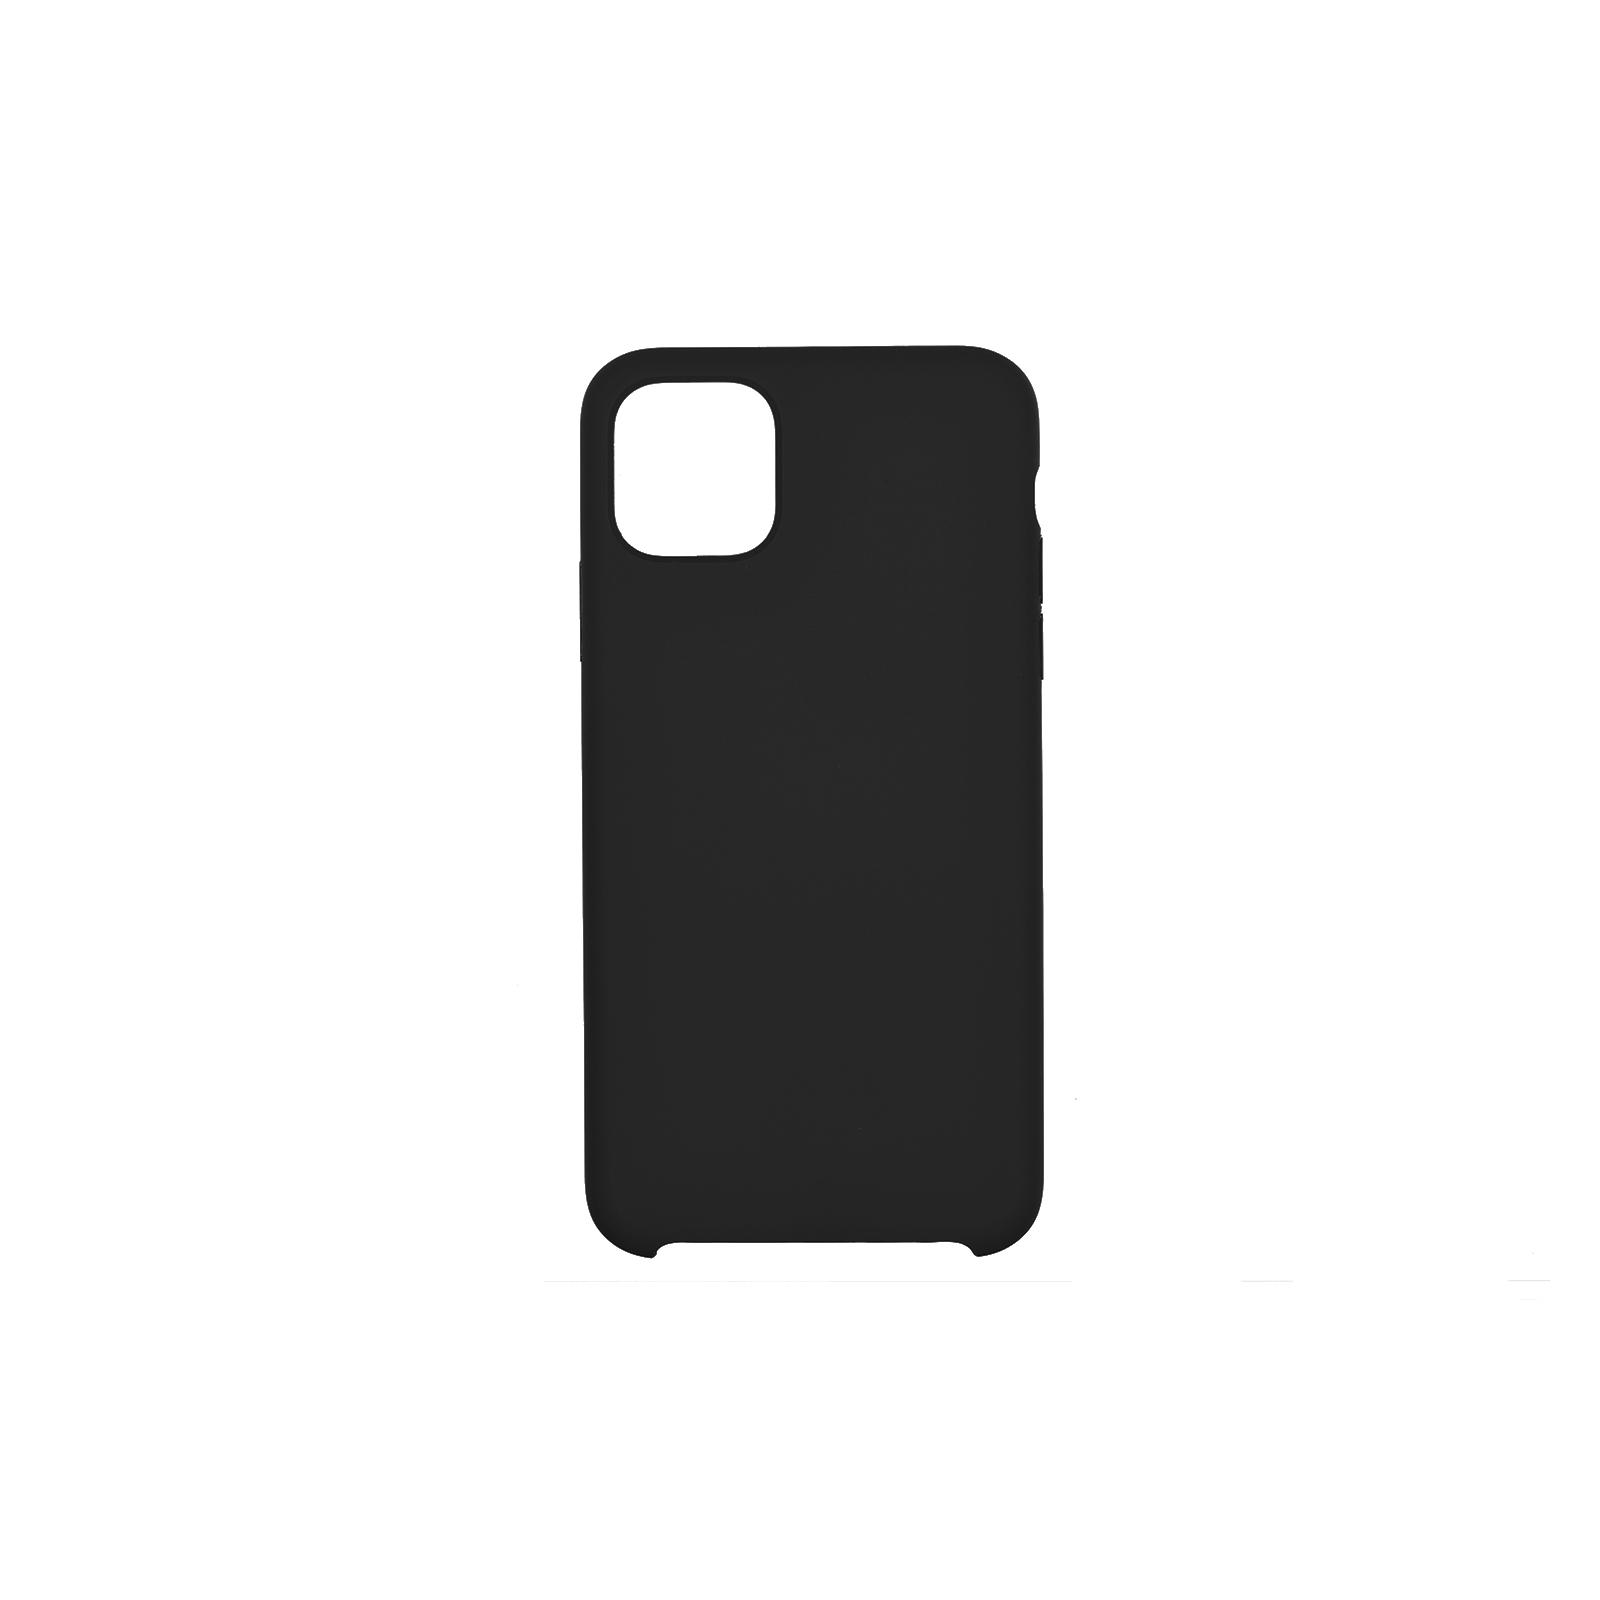 "Чехол для моб. телефона 2E Apple iPhone 11 Pro Max (6.5""), Liquid Silicone, Black (2E-IPH-11PRM-OCLS-BK)"